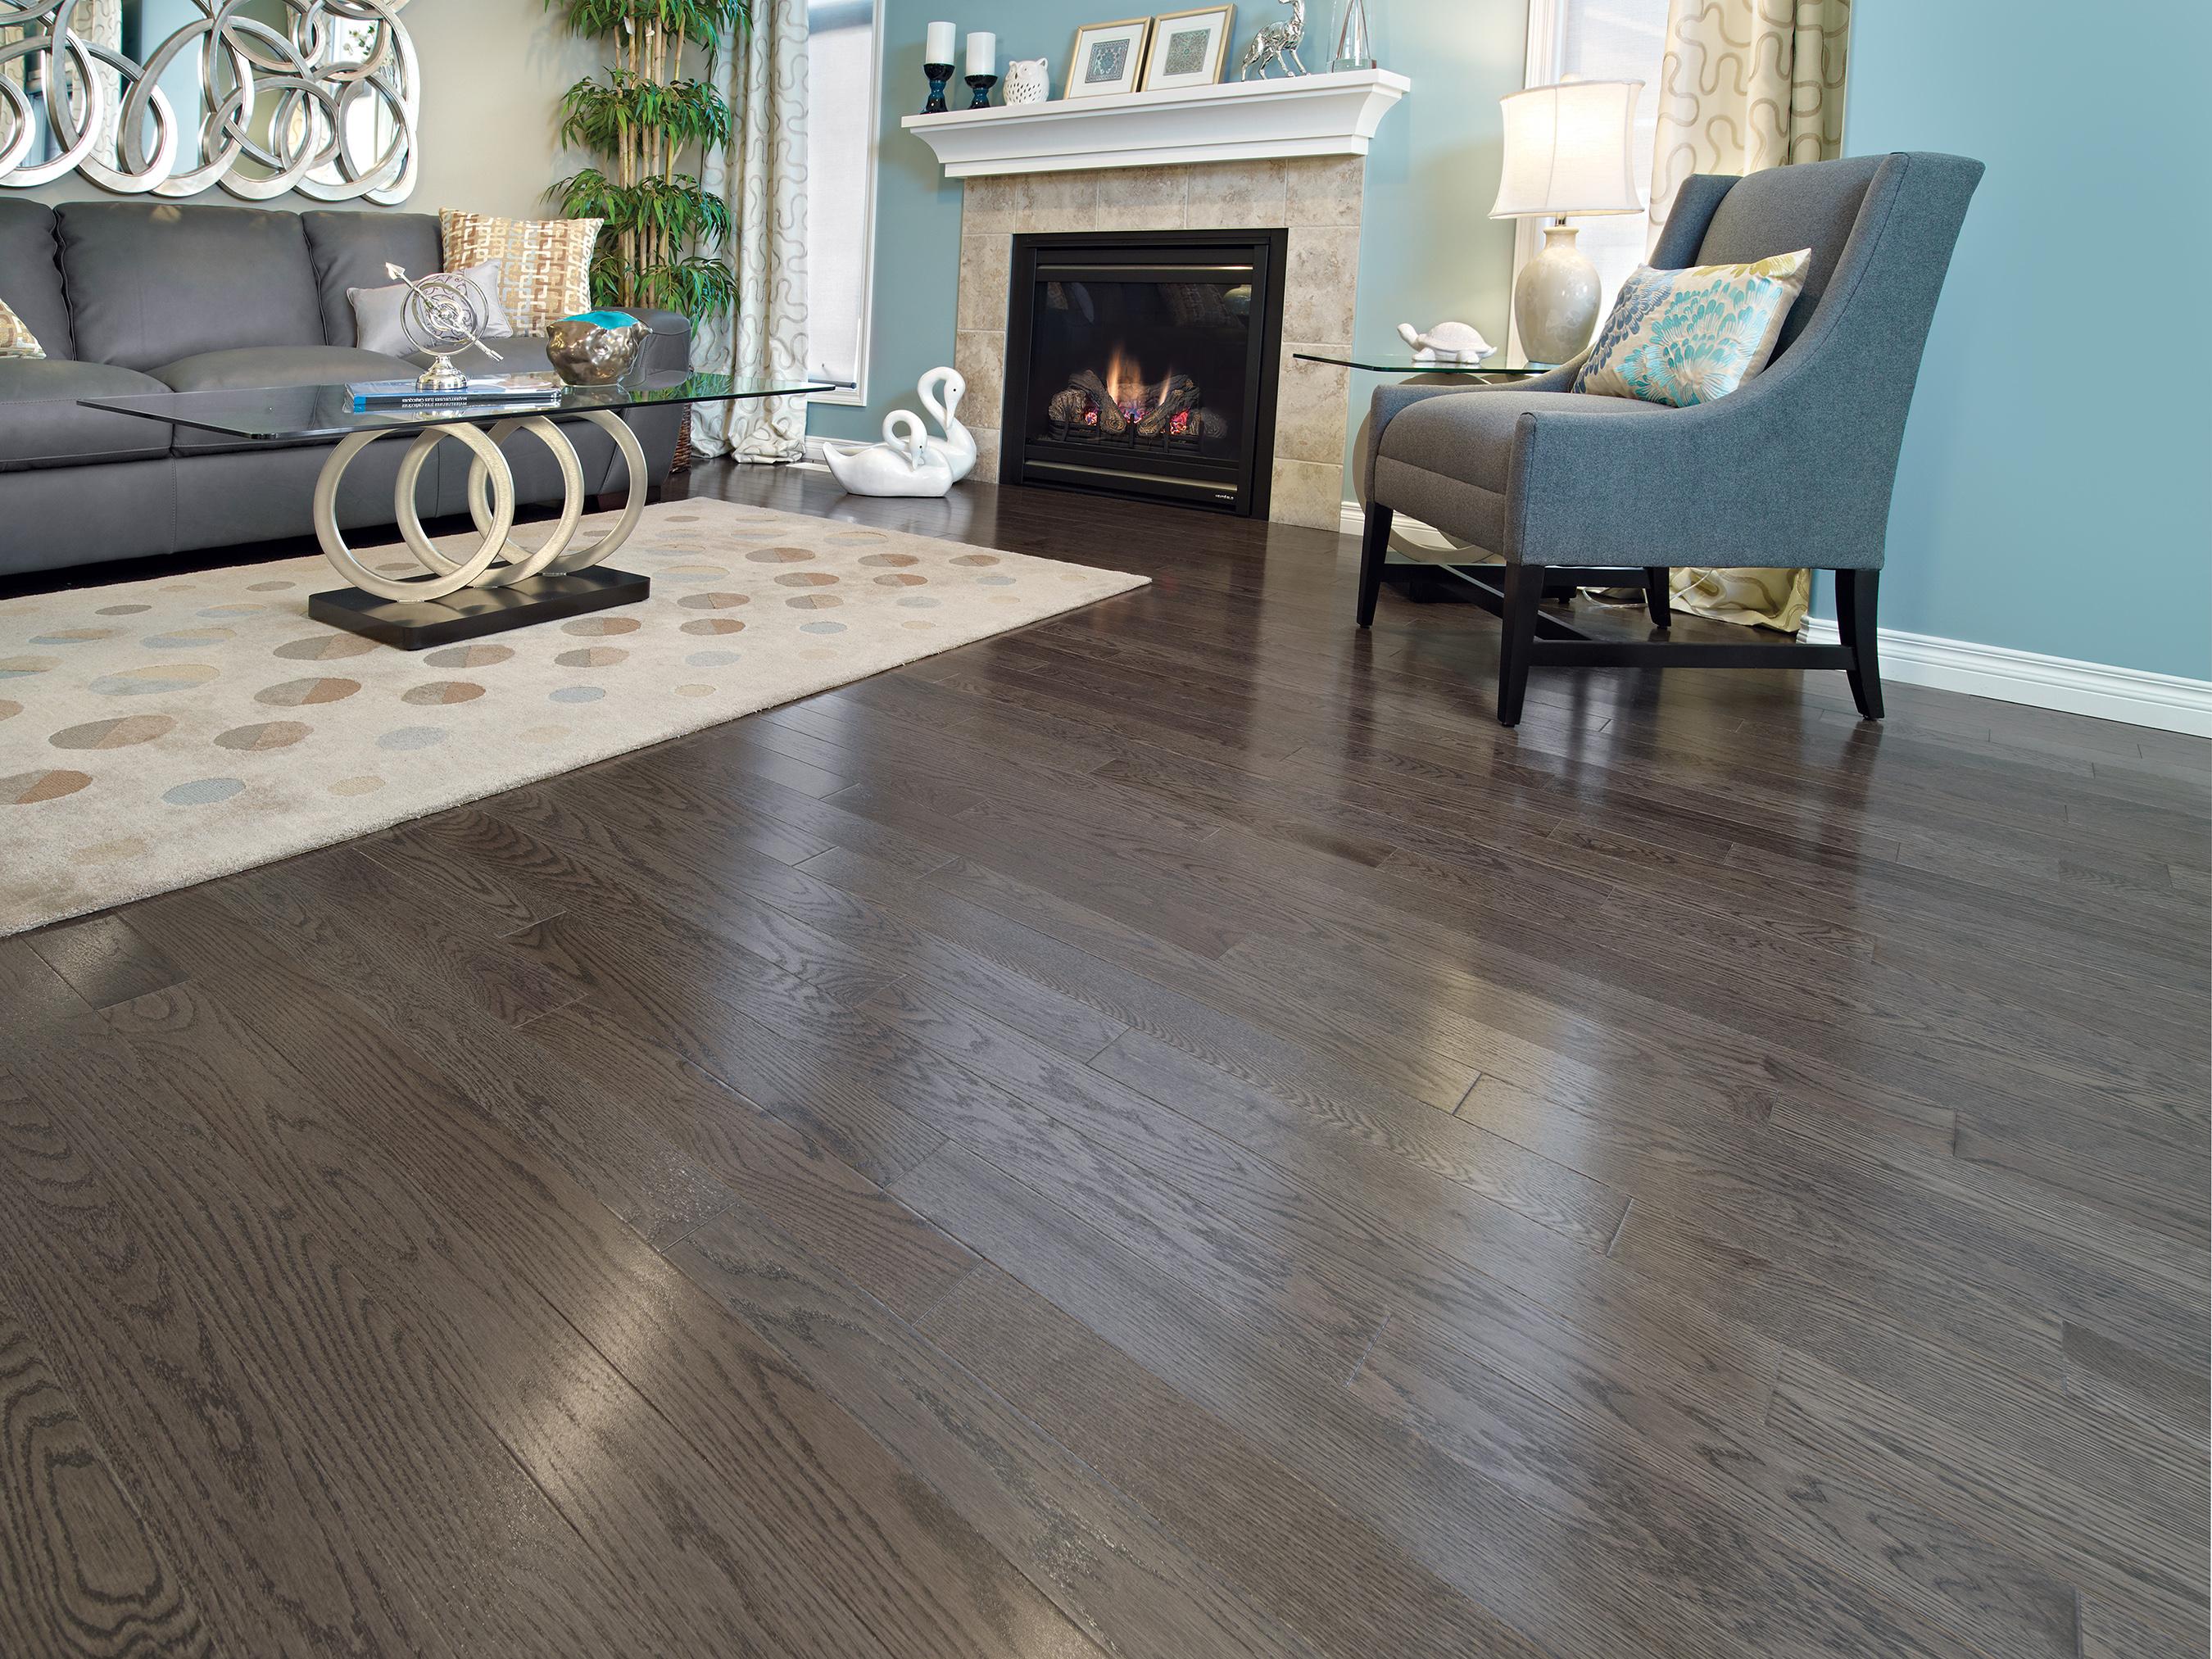 Red Oak Charcoal Mirage Hardwood Floors